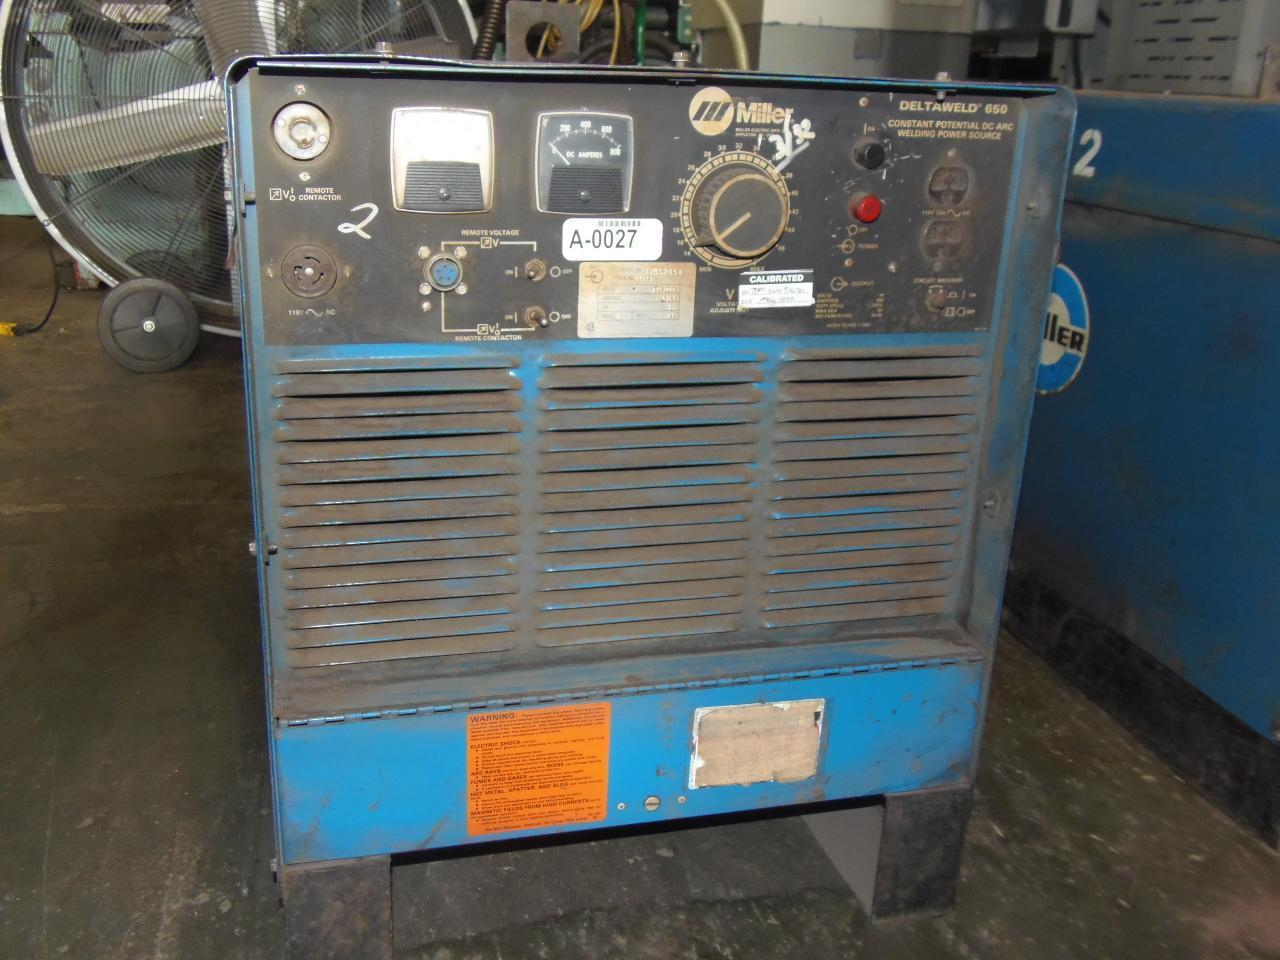 Miller 650 Amp Wire Feed Welder, Model Deltaweld 650 with D52 Wire feeder